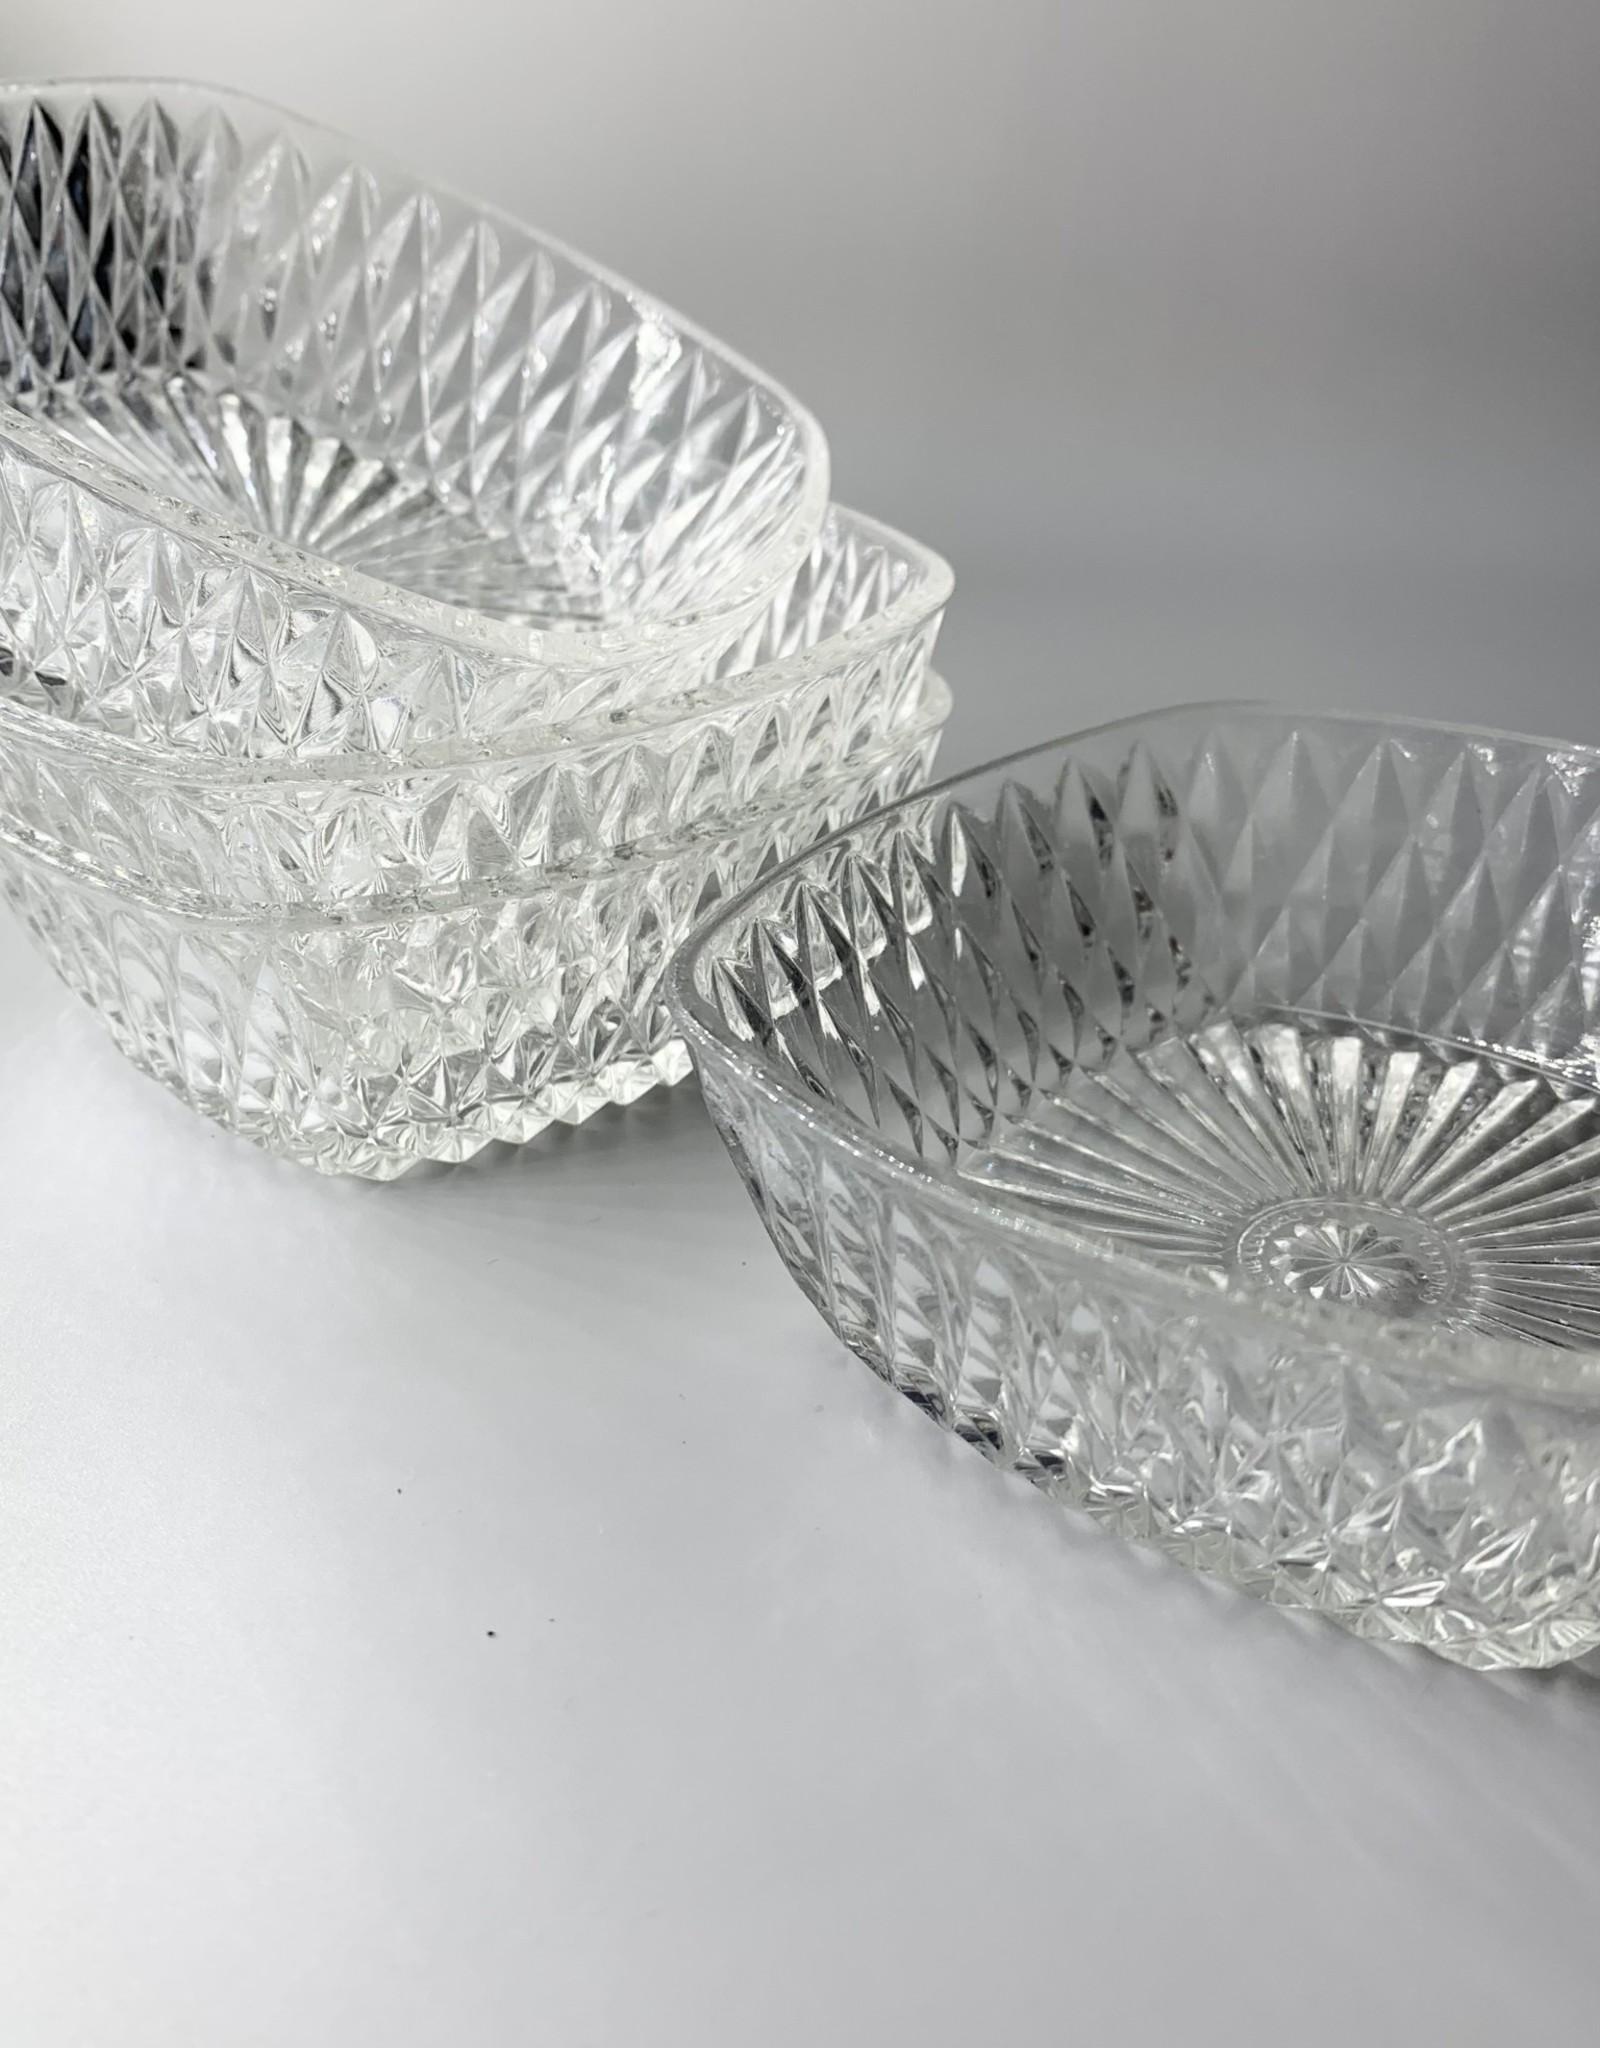 Set of 4 Square Dessert Bowls